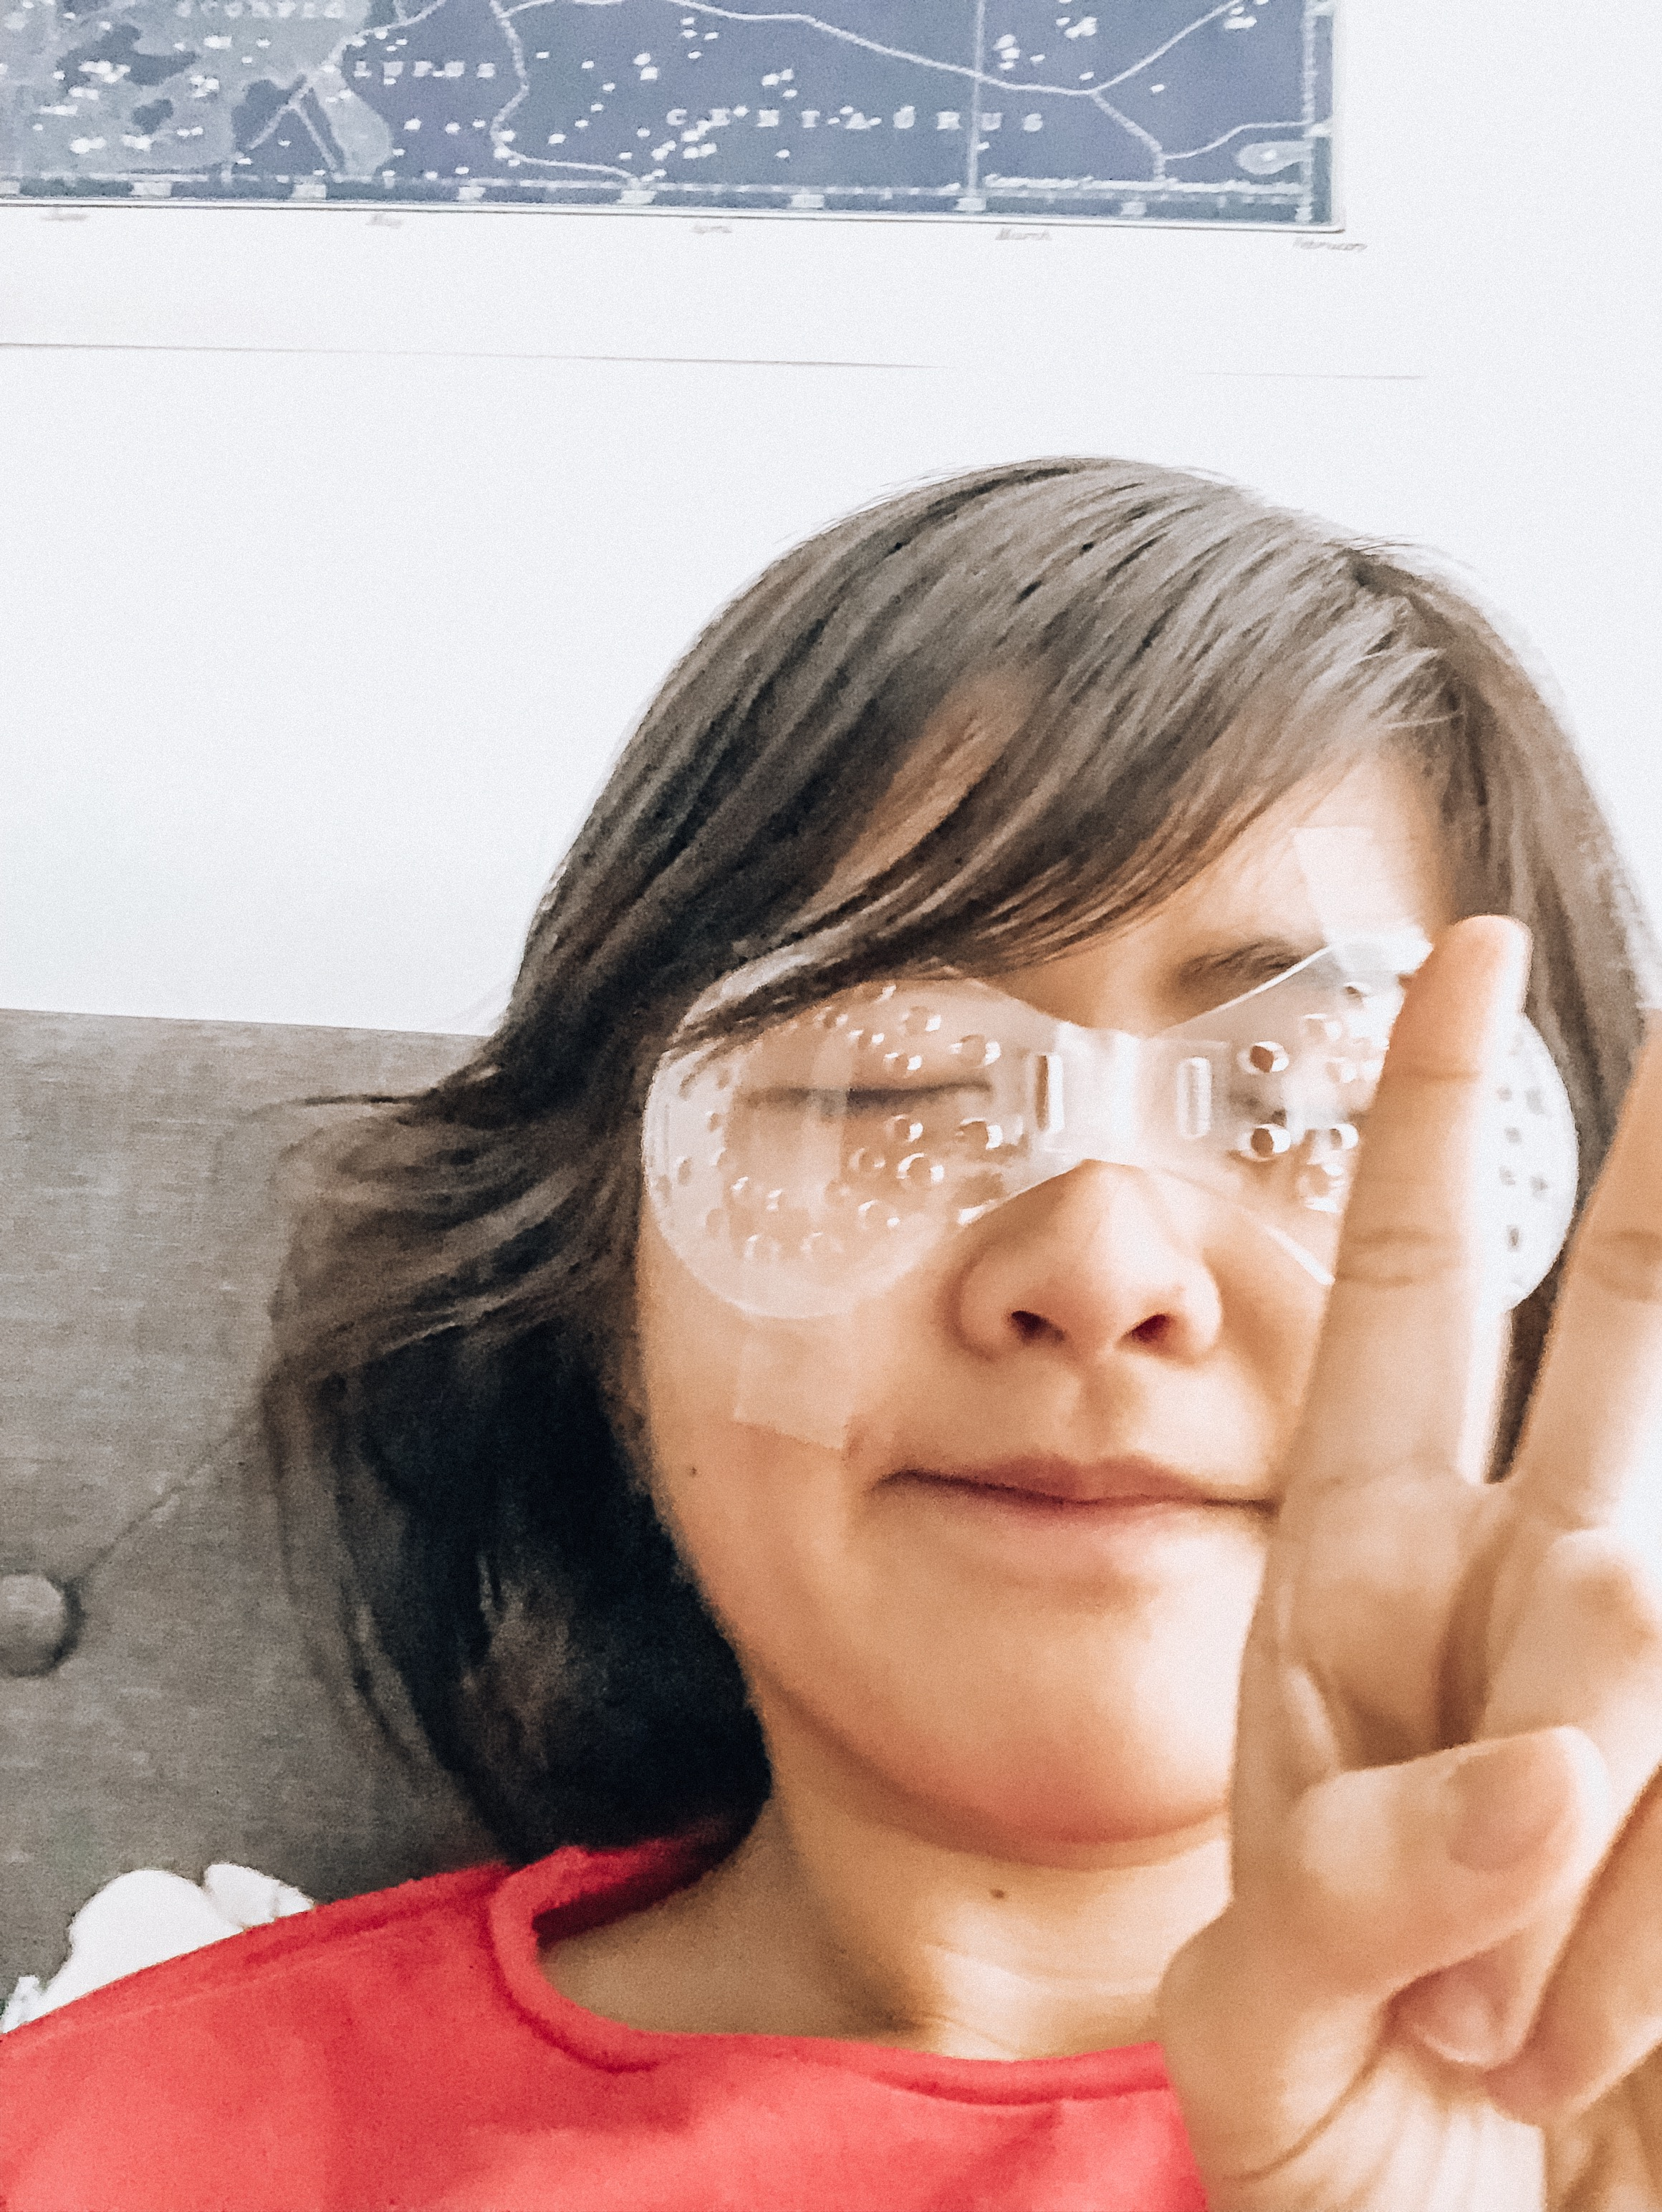 Clear Plastic Sleeping Shield